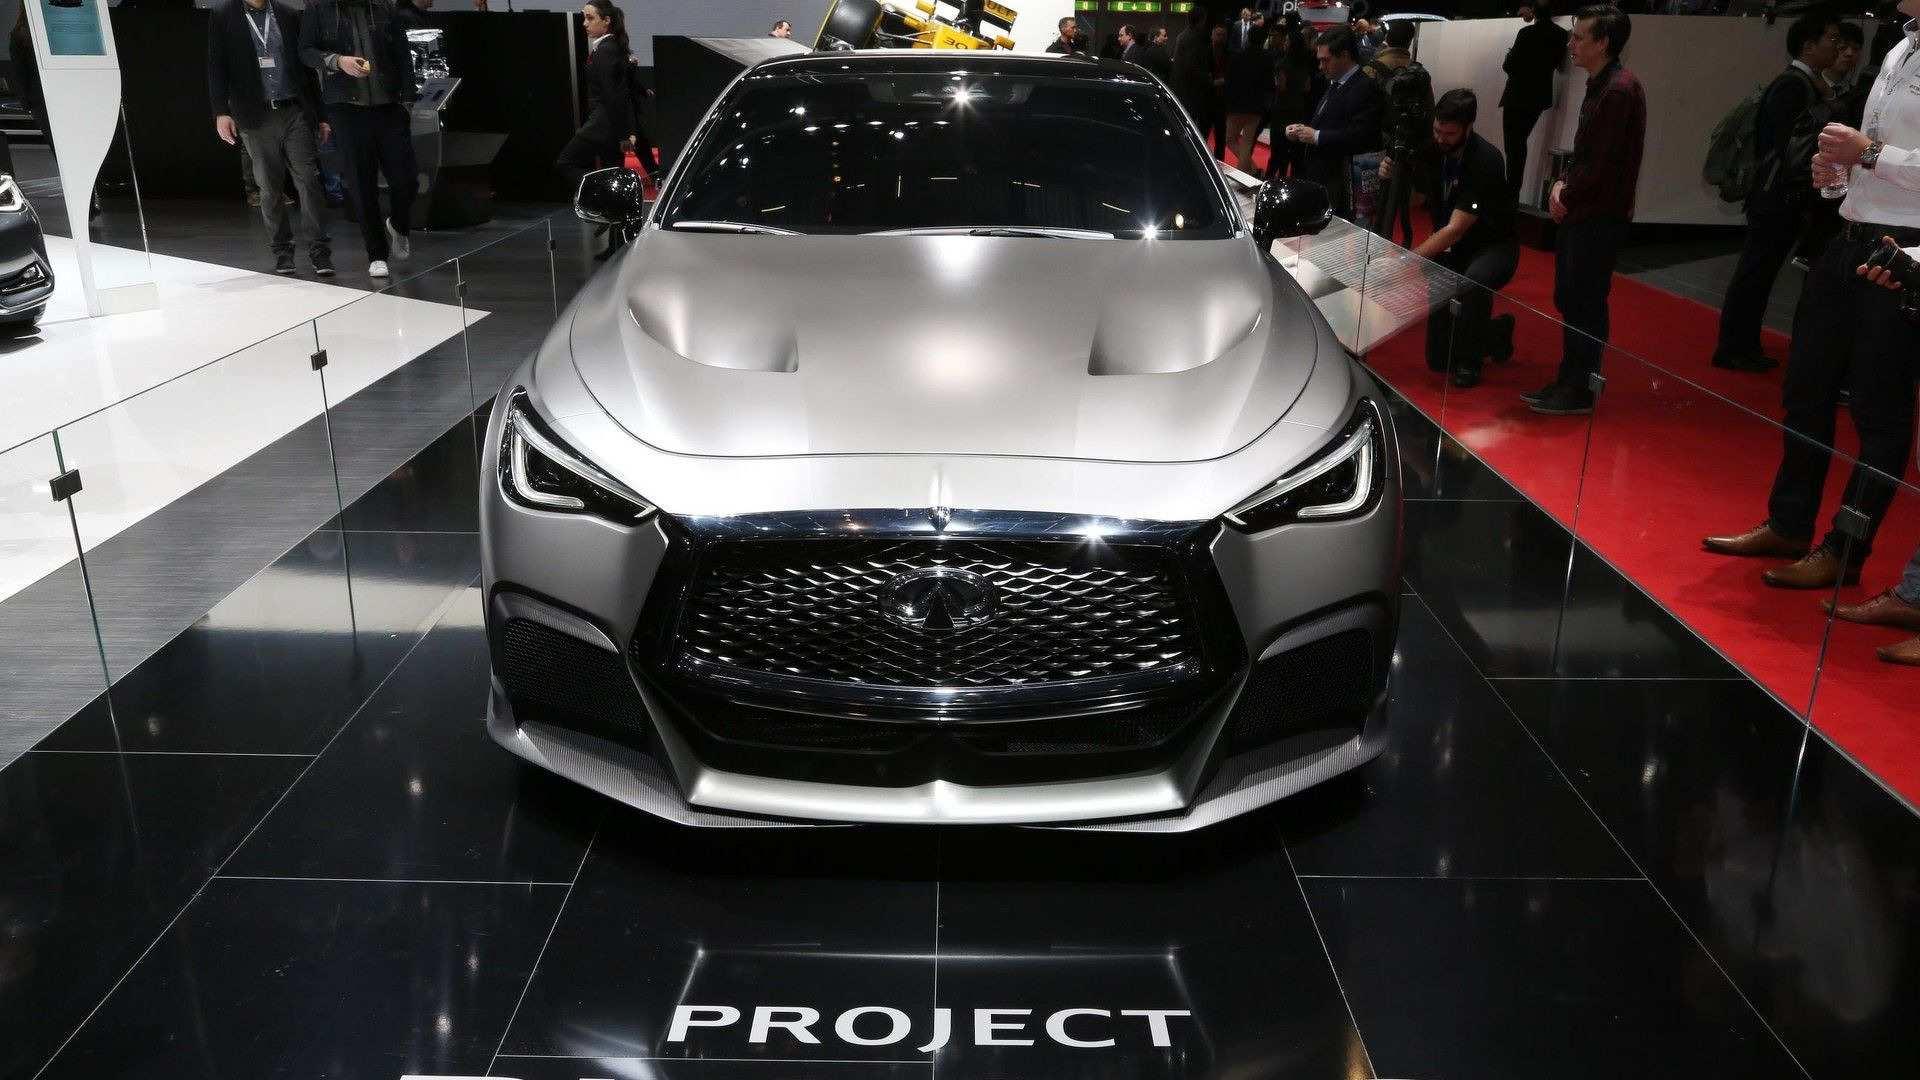 25 Great 2020 Infiniti Q60 Black S New Review by 2020 Infiniti Q60 Black S